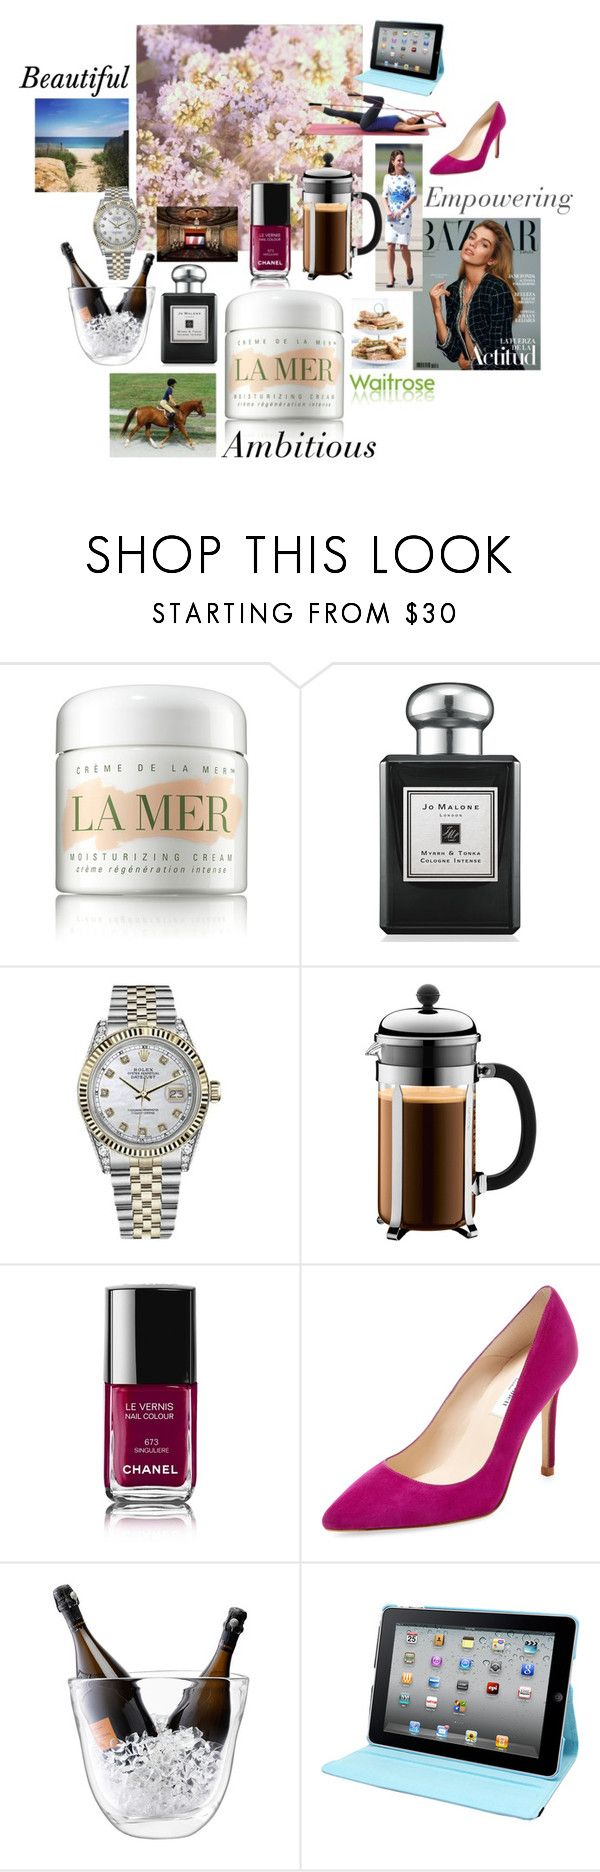 """L K Bennett target consumer"" by emily-hutchin on Polyvore featuring La Mer, CO, Marks & Spencer, castro, Jo Malone, Rolex, L.K.Bennett, Bodum, Chanel and LSA International"